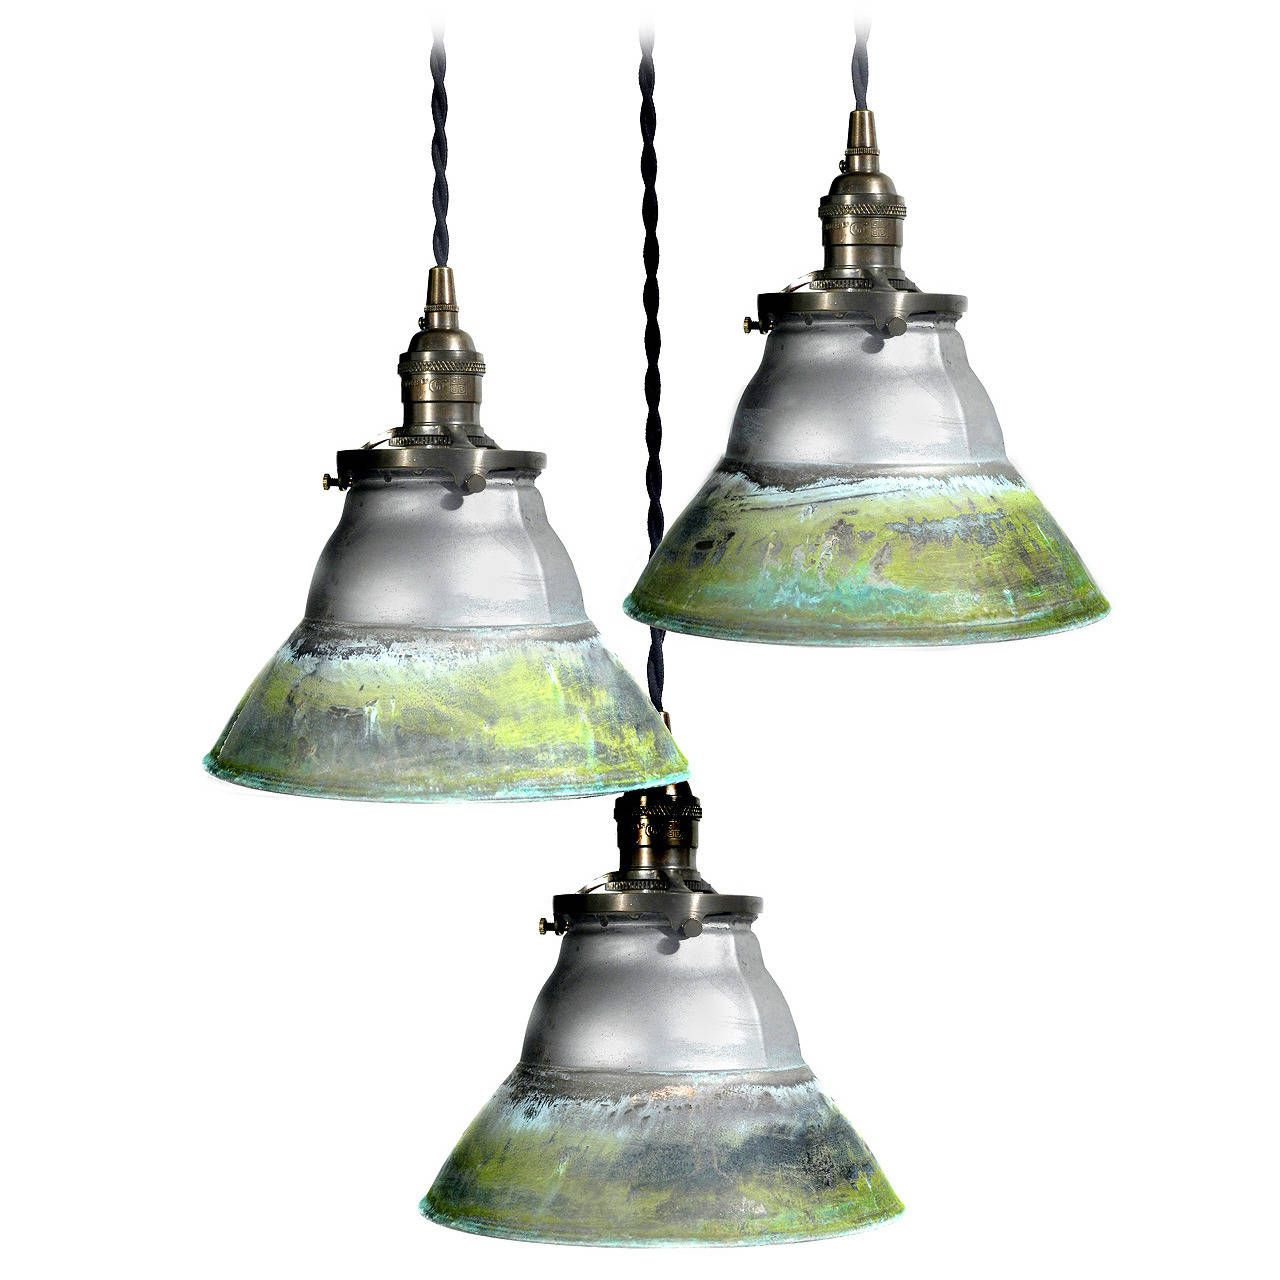 mercury glass pendant lighting. Verdigris Copper Mercury Glass Mirrored Pendants   1stdibs.com Pendant Lighting